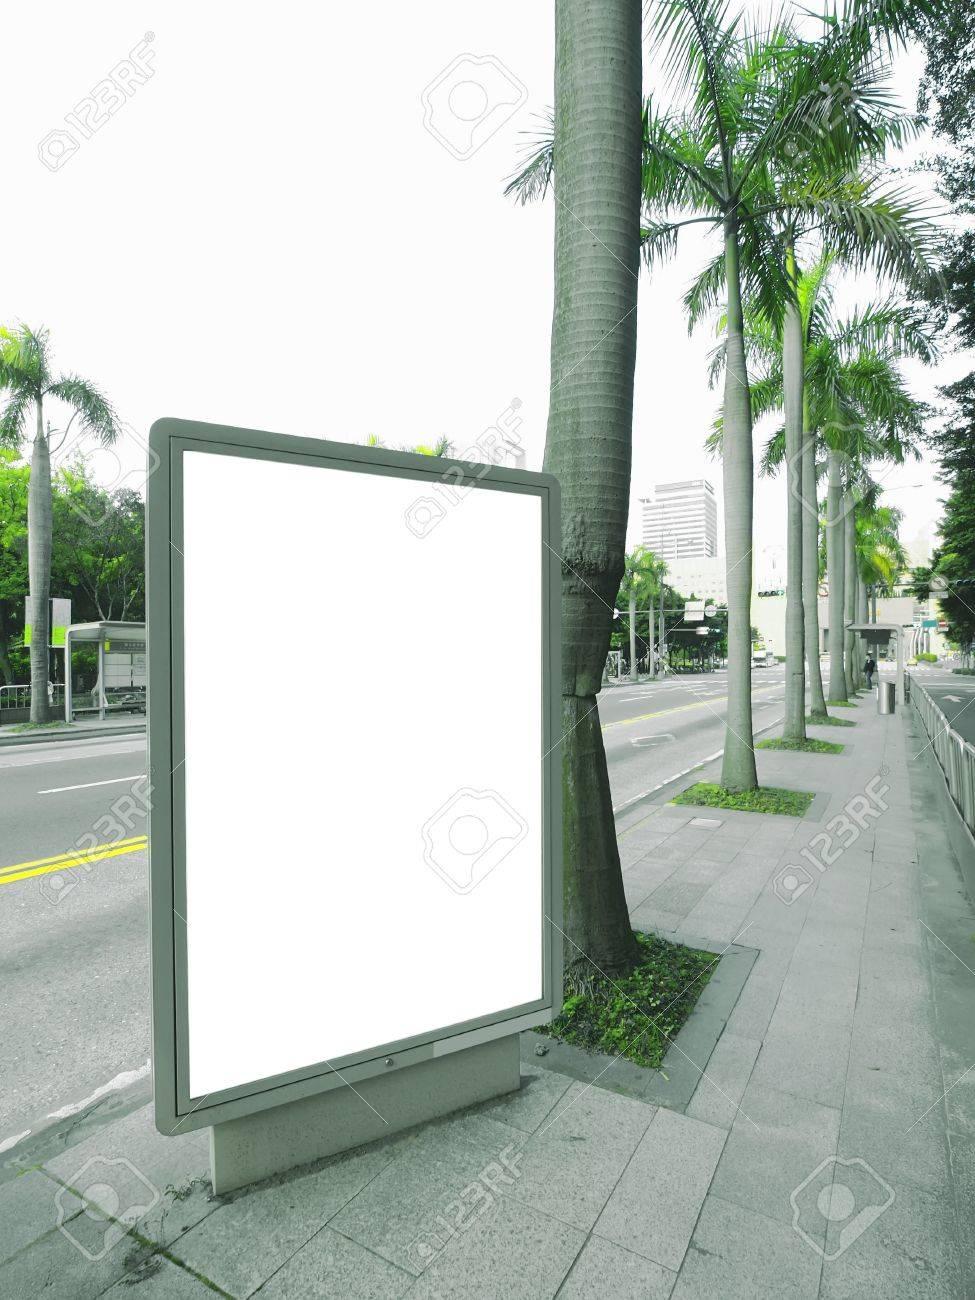 Blank billboard on sidewalk Stock Photo - 9723120